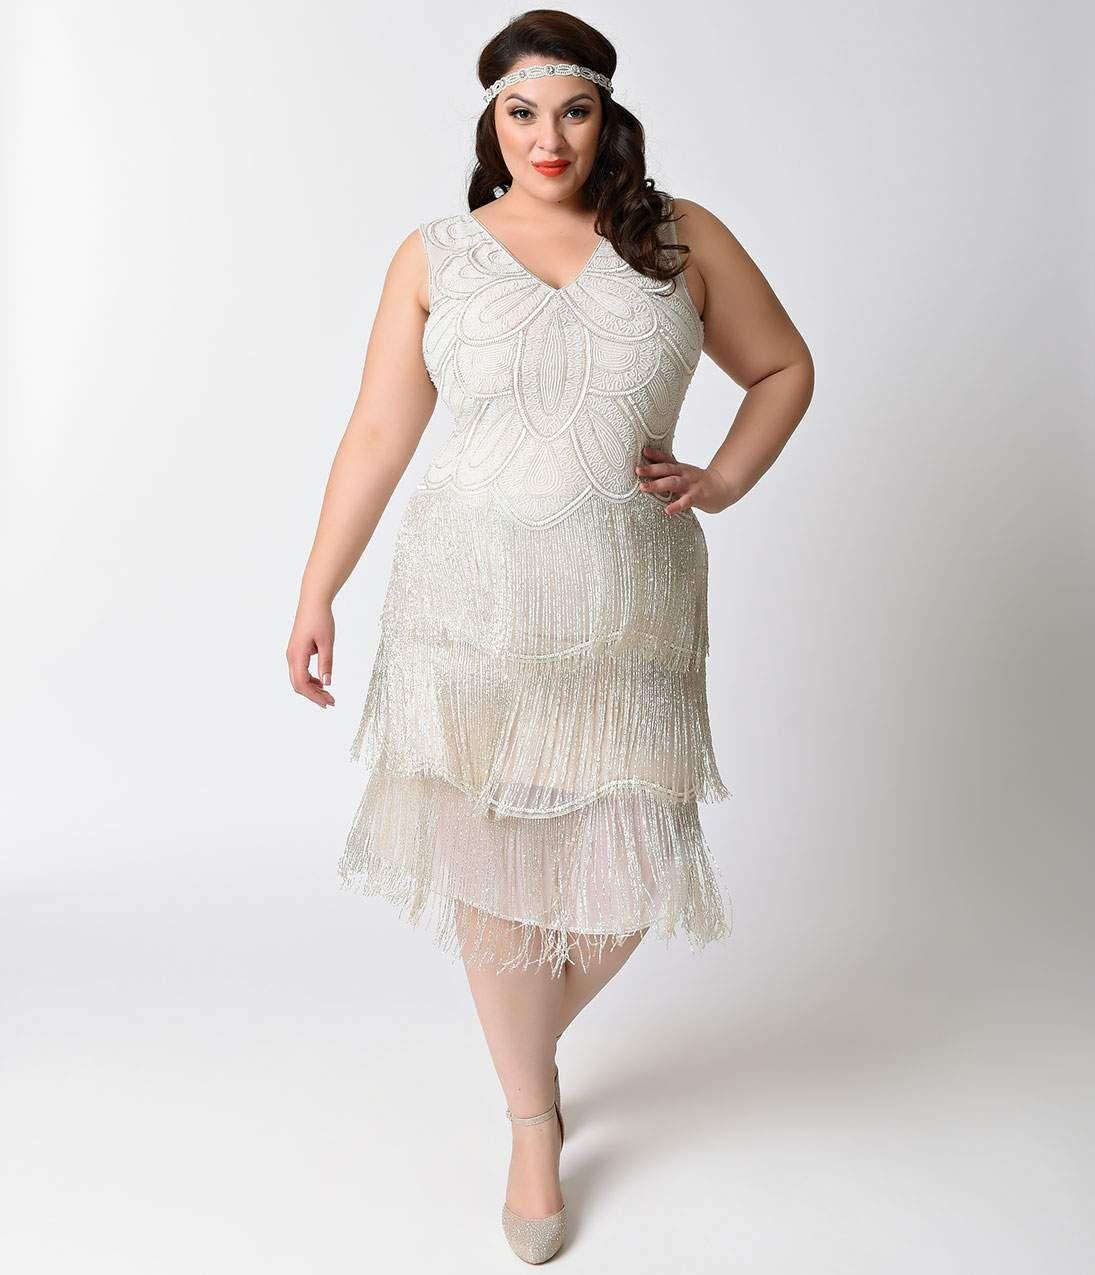 Pretty Twenties Style Wedding Dresses Gallery - Wedding Dress Ideas ...